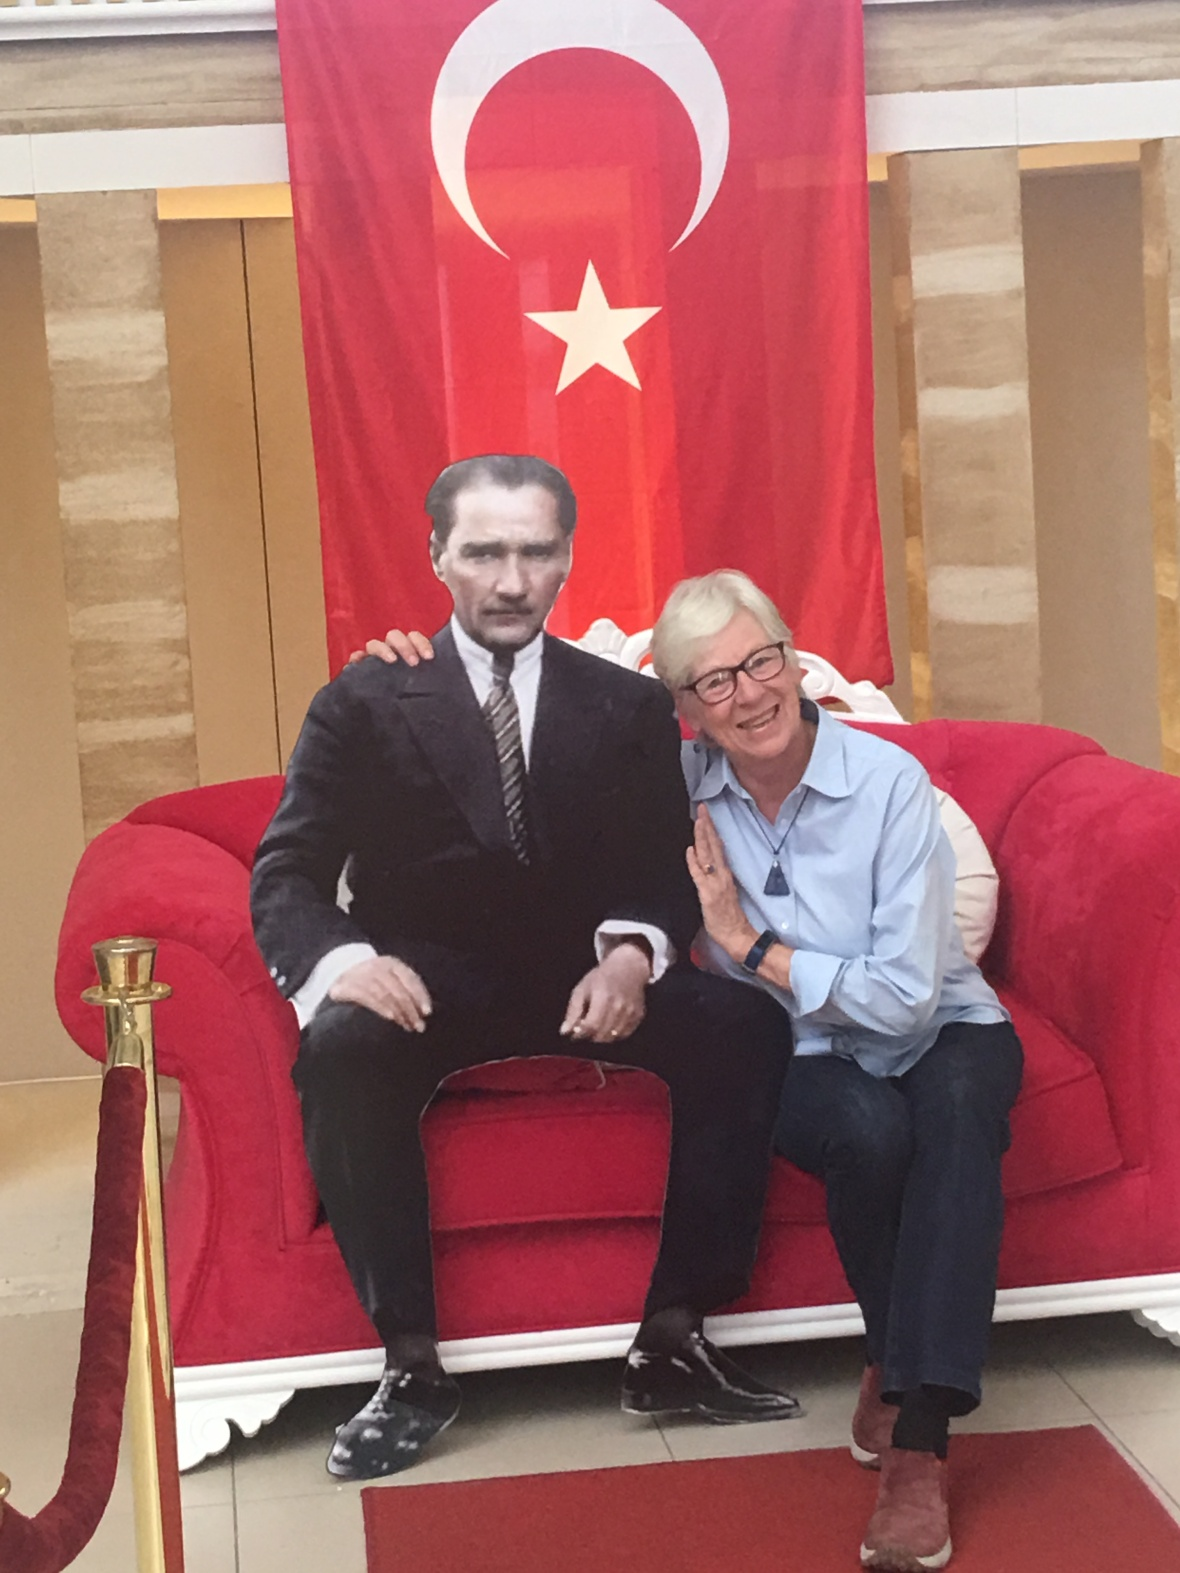 Ataturk and me